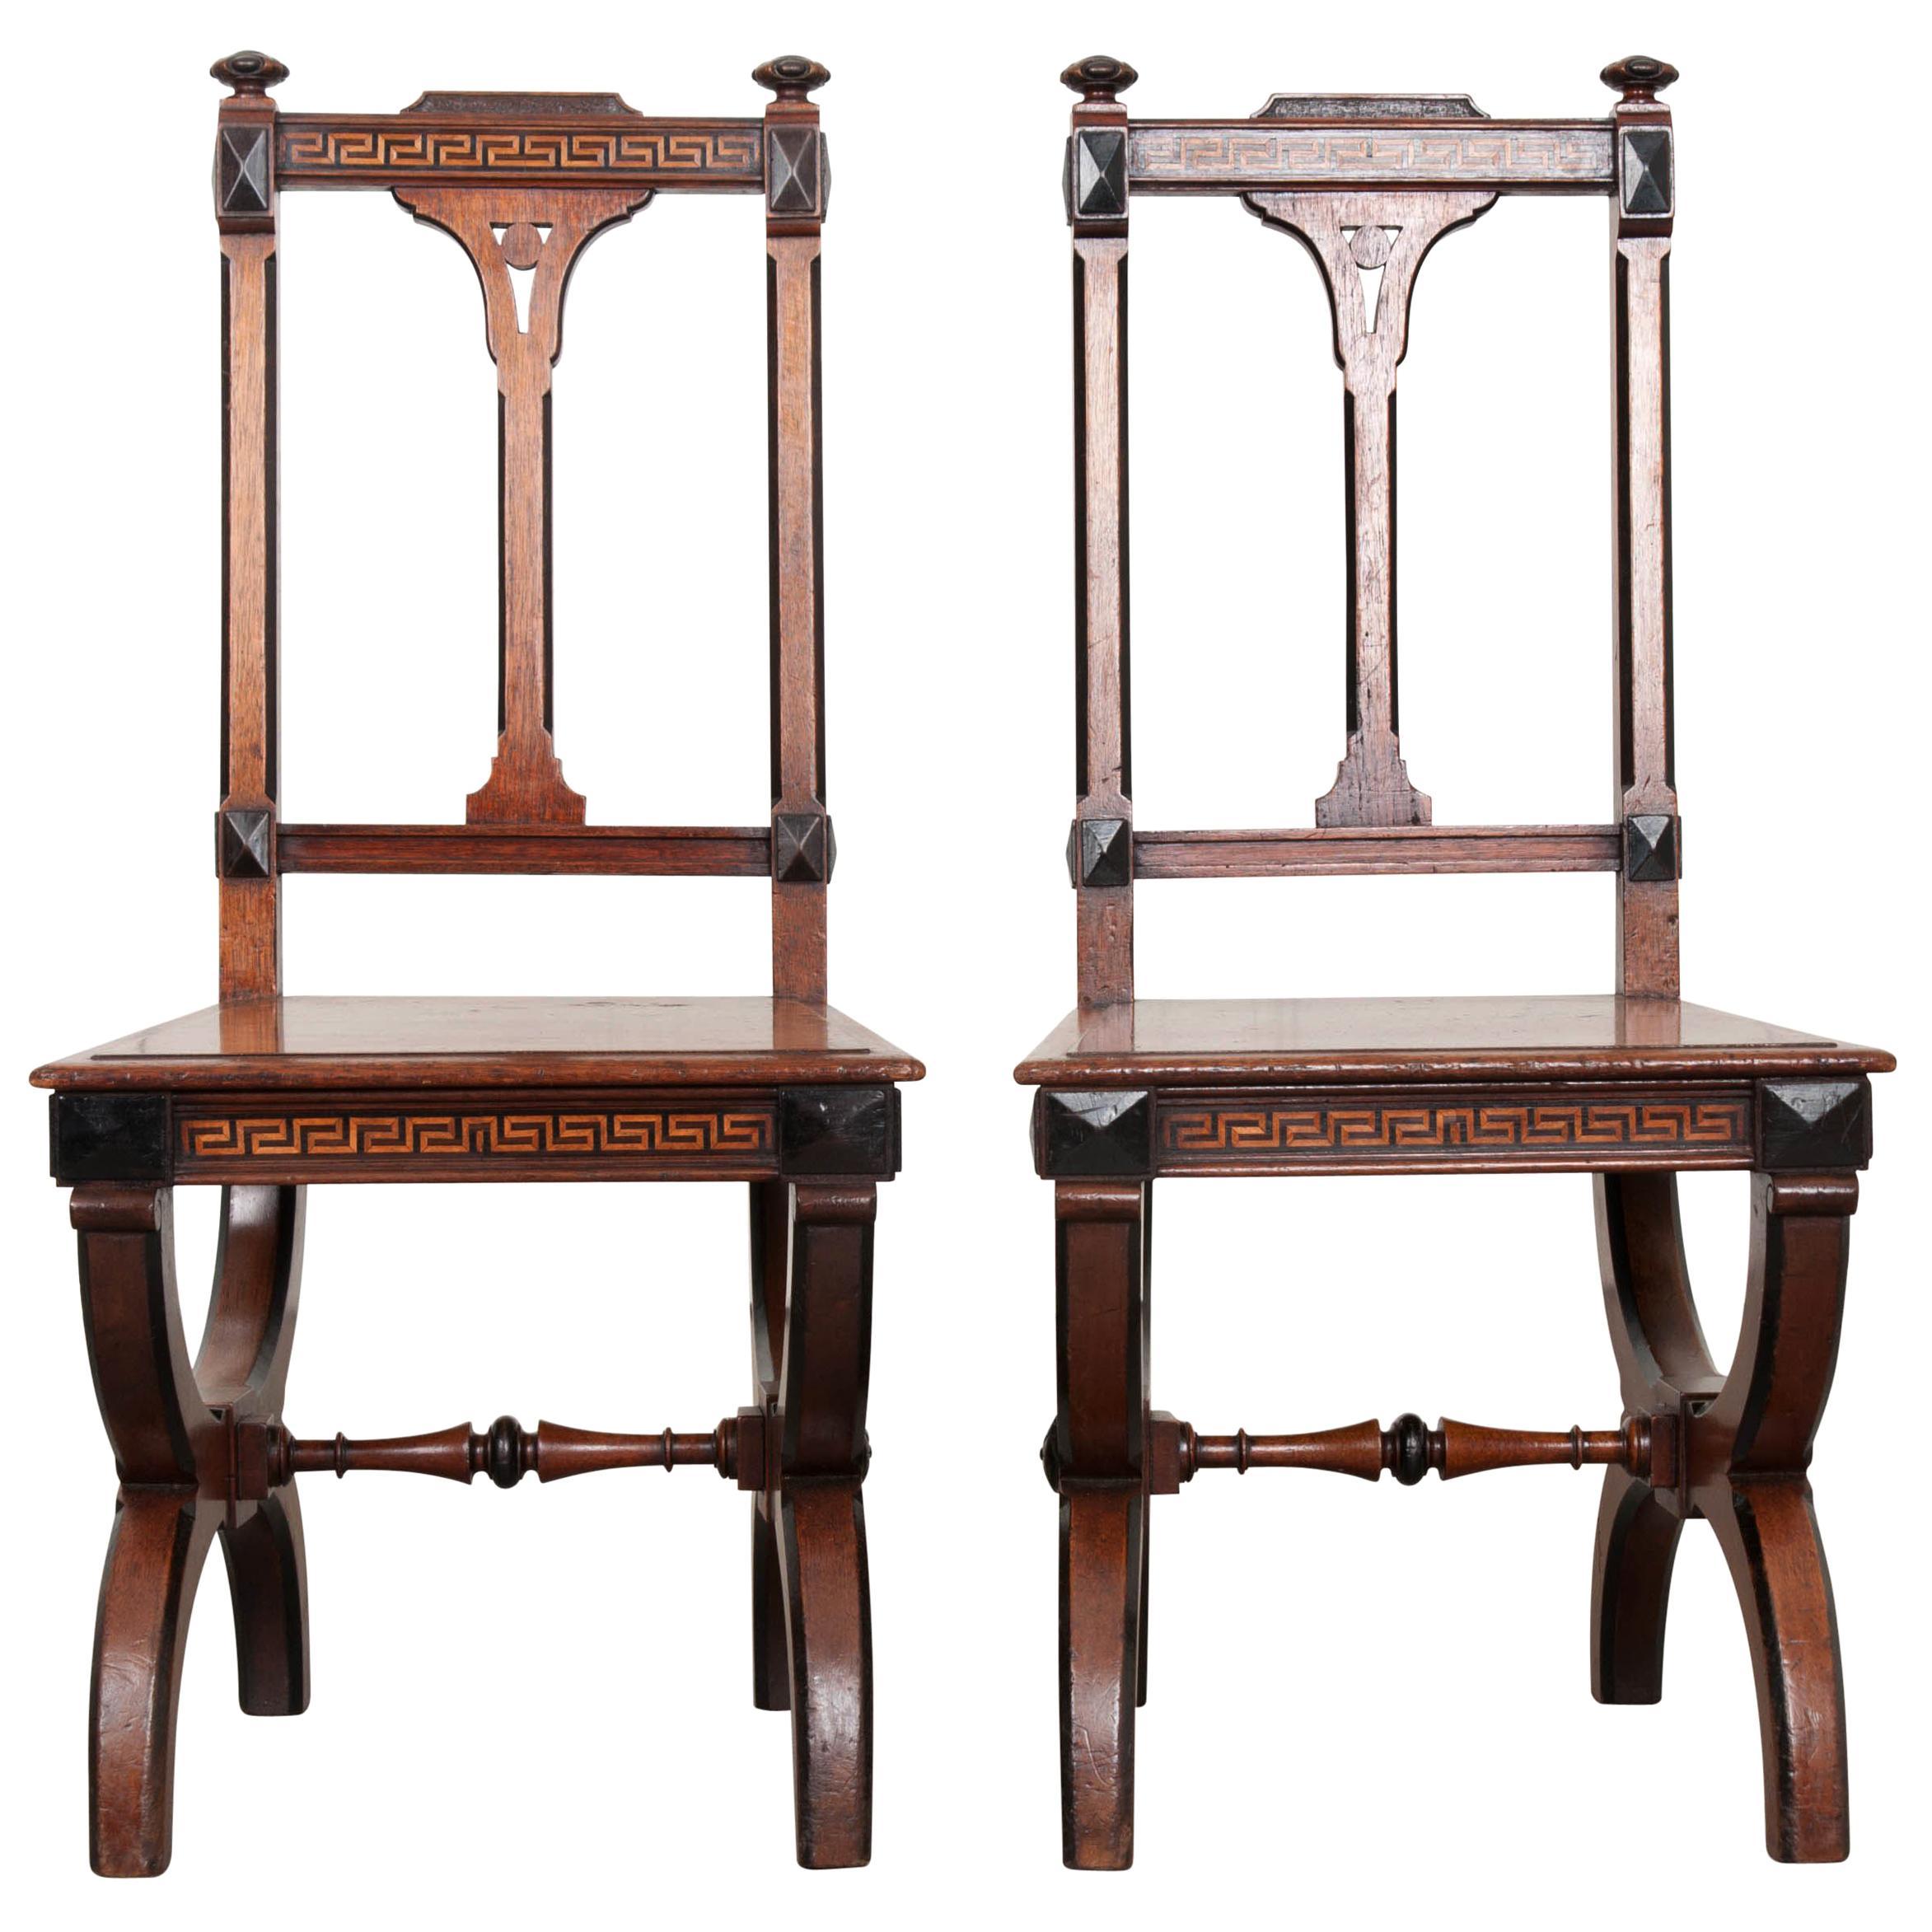 Pair of English 19th Century Inlay Mahogany Hall Chairs